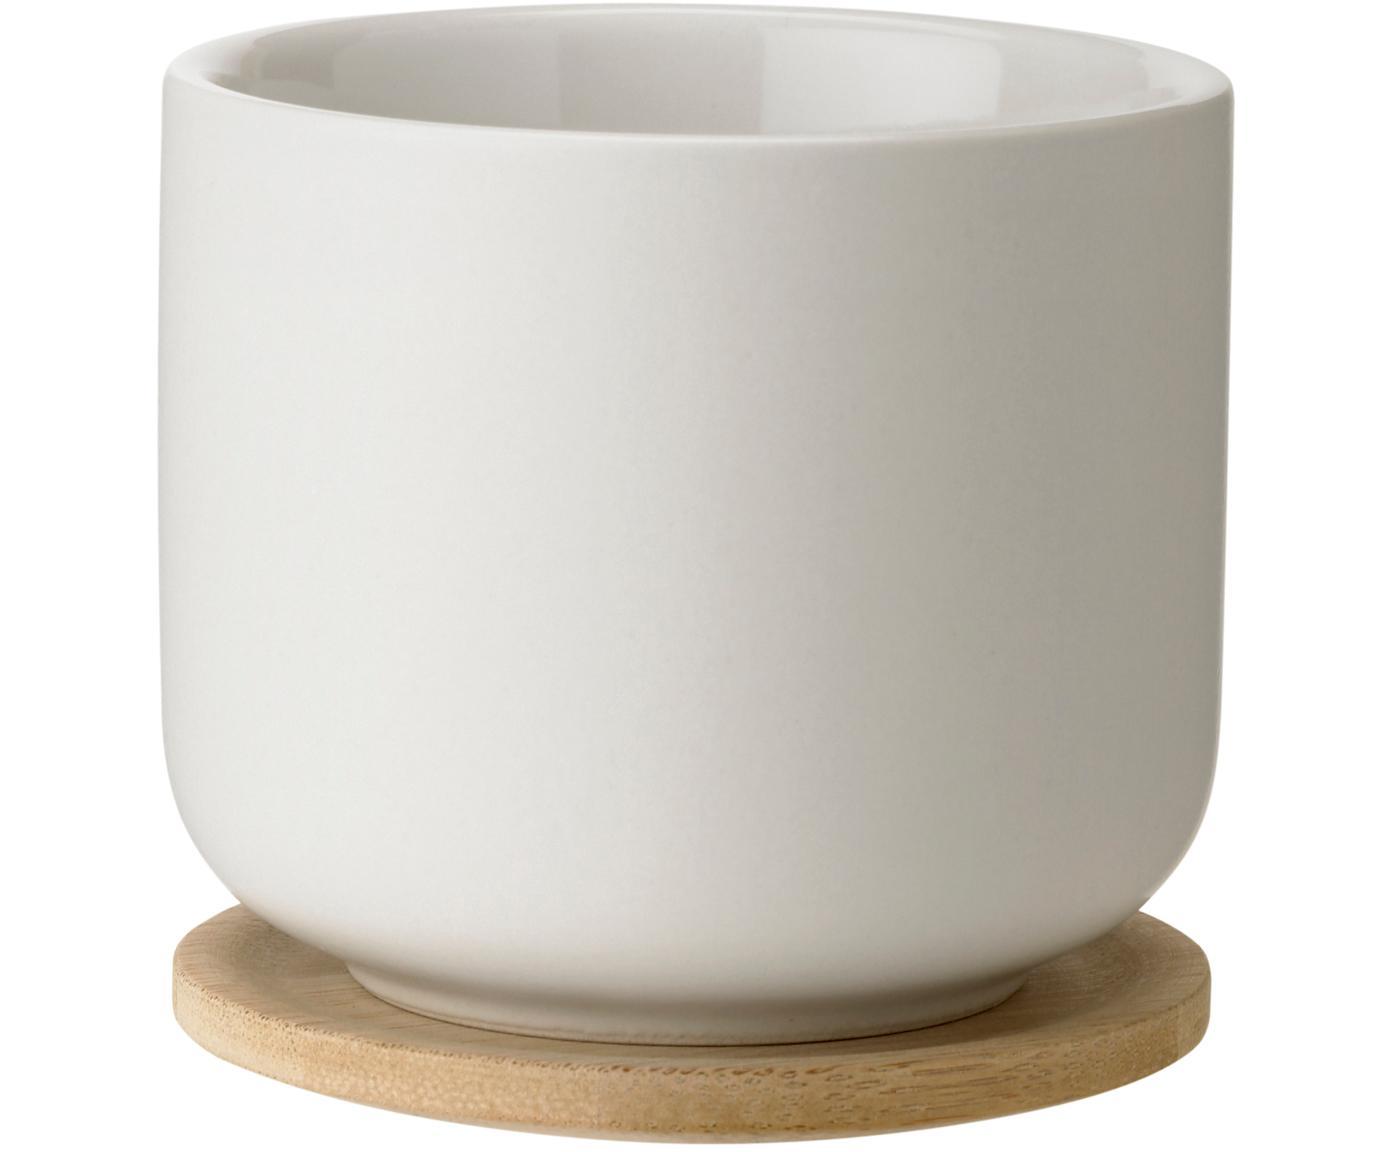 Tazza con coperchio/sottobicchiere in bianco Theo, Bianco latteo, bambù, Ø 8 x Alt. 8 cm